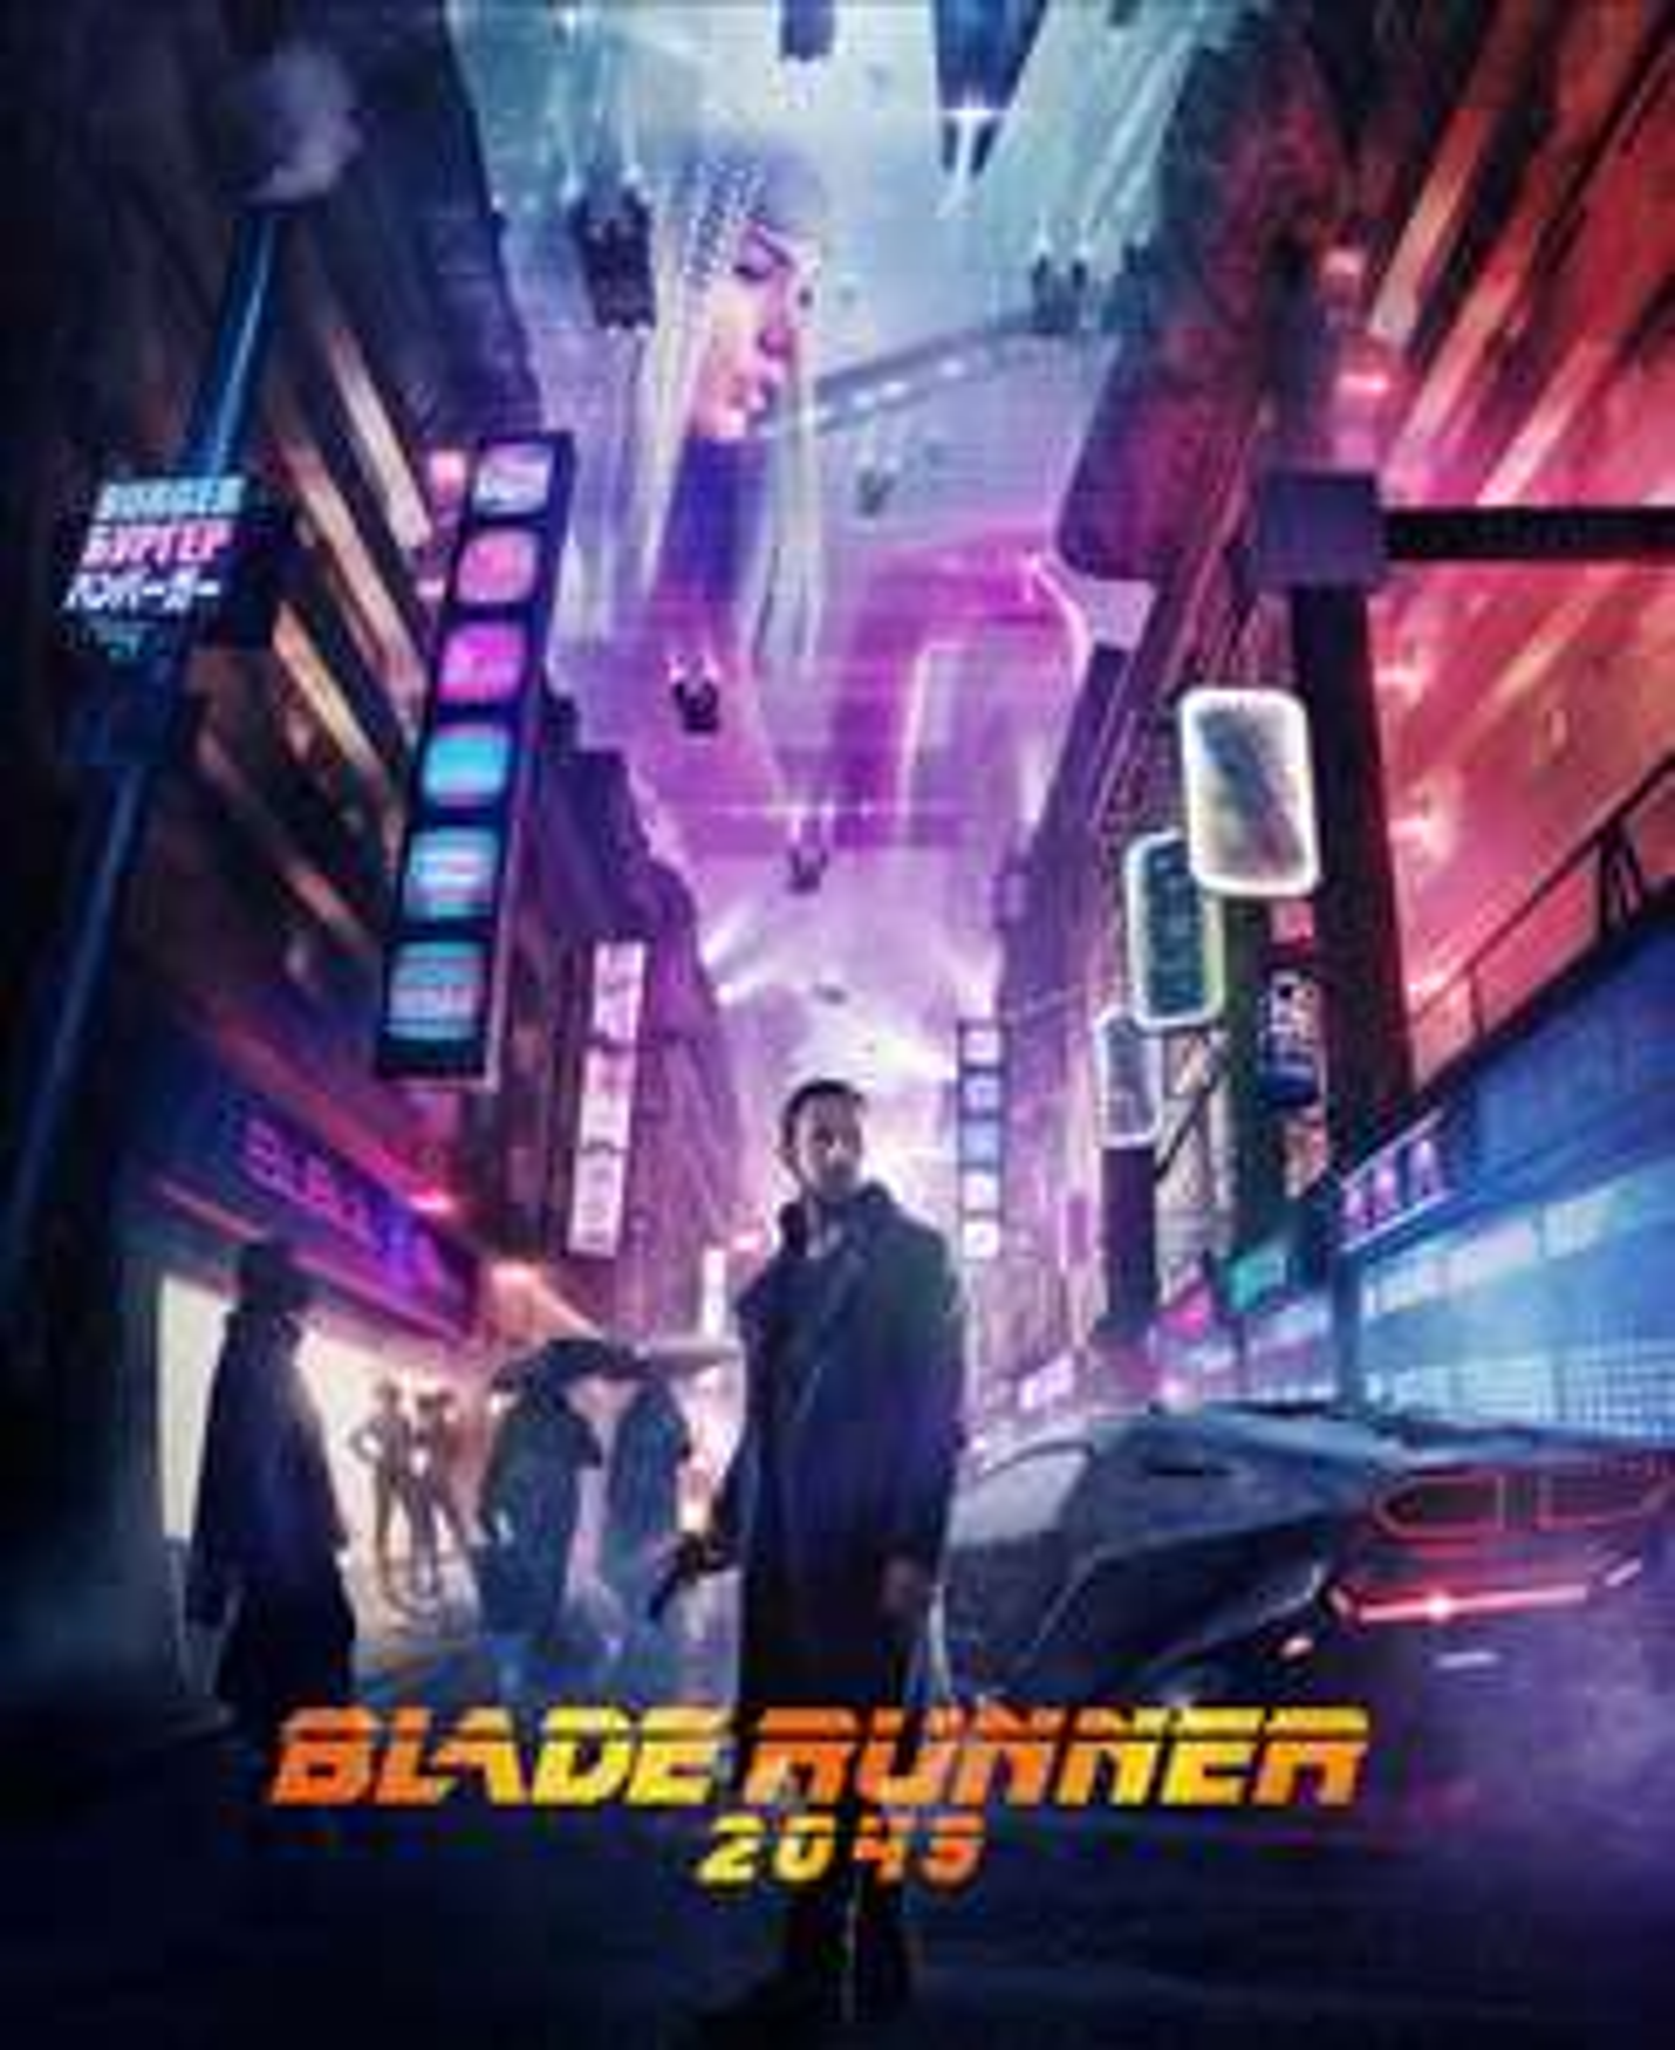 Blade Runner 2049 Limited Edition 4K Ultra HD Blu-Ray - £17.49 delivered @ HMV